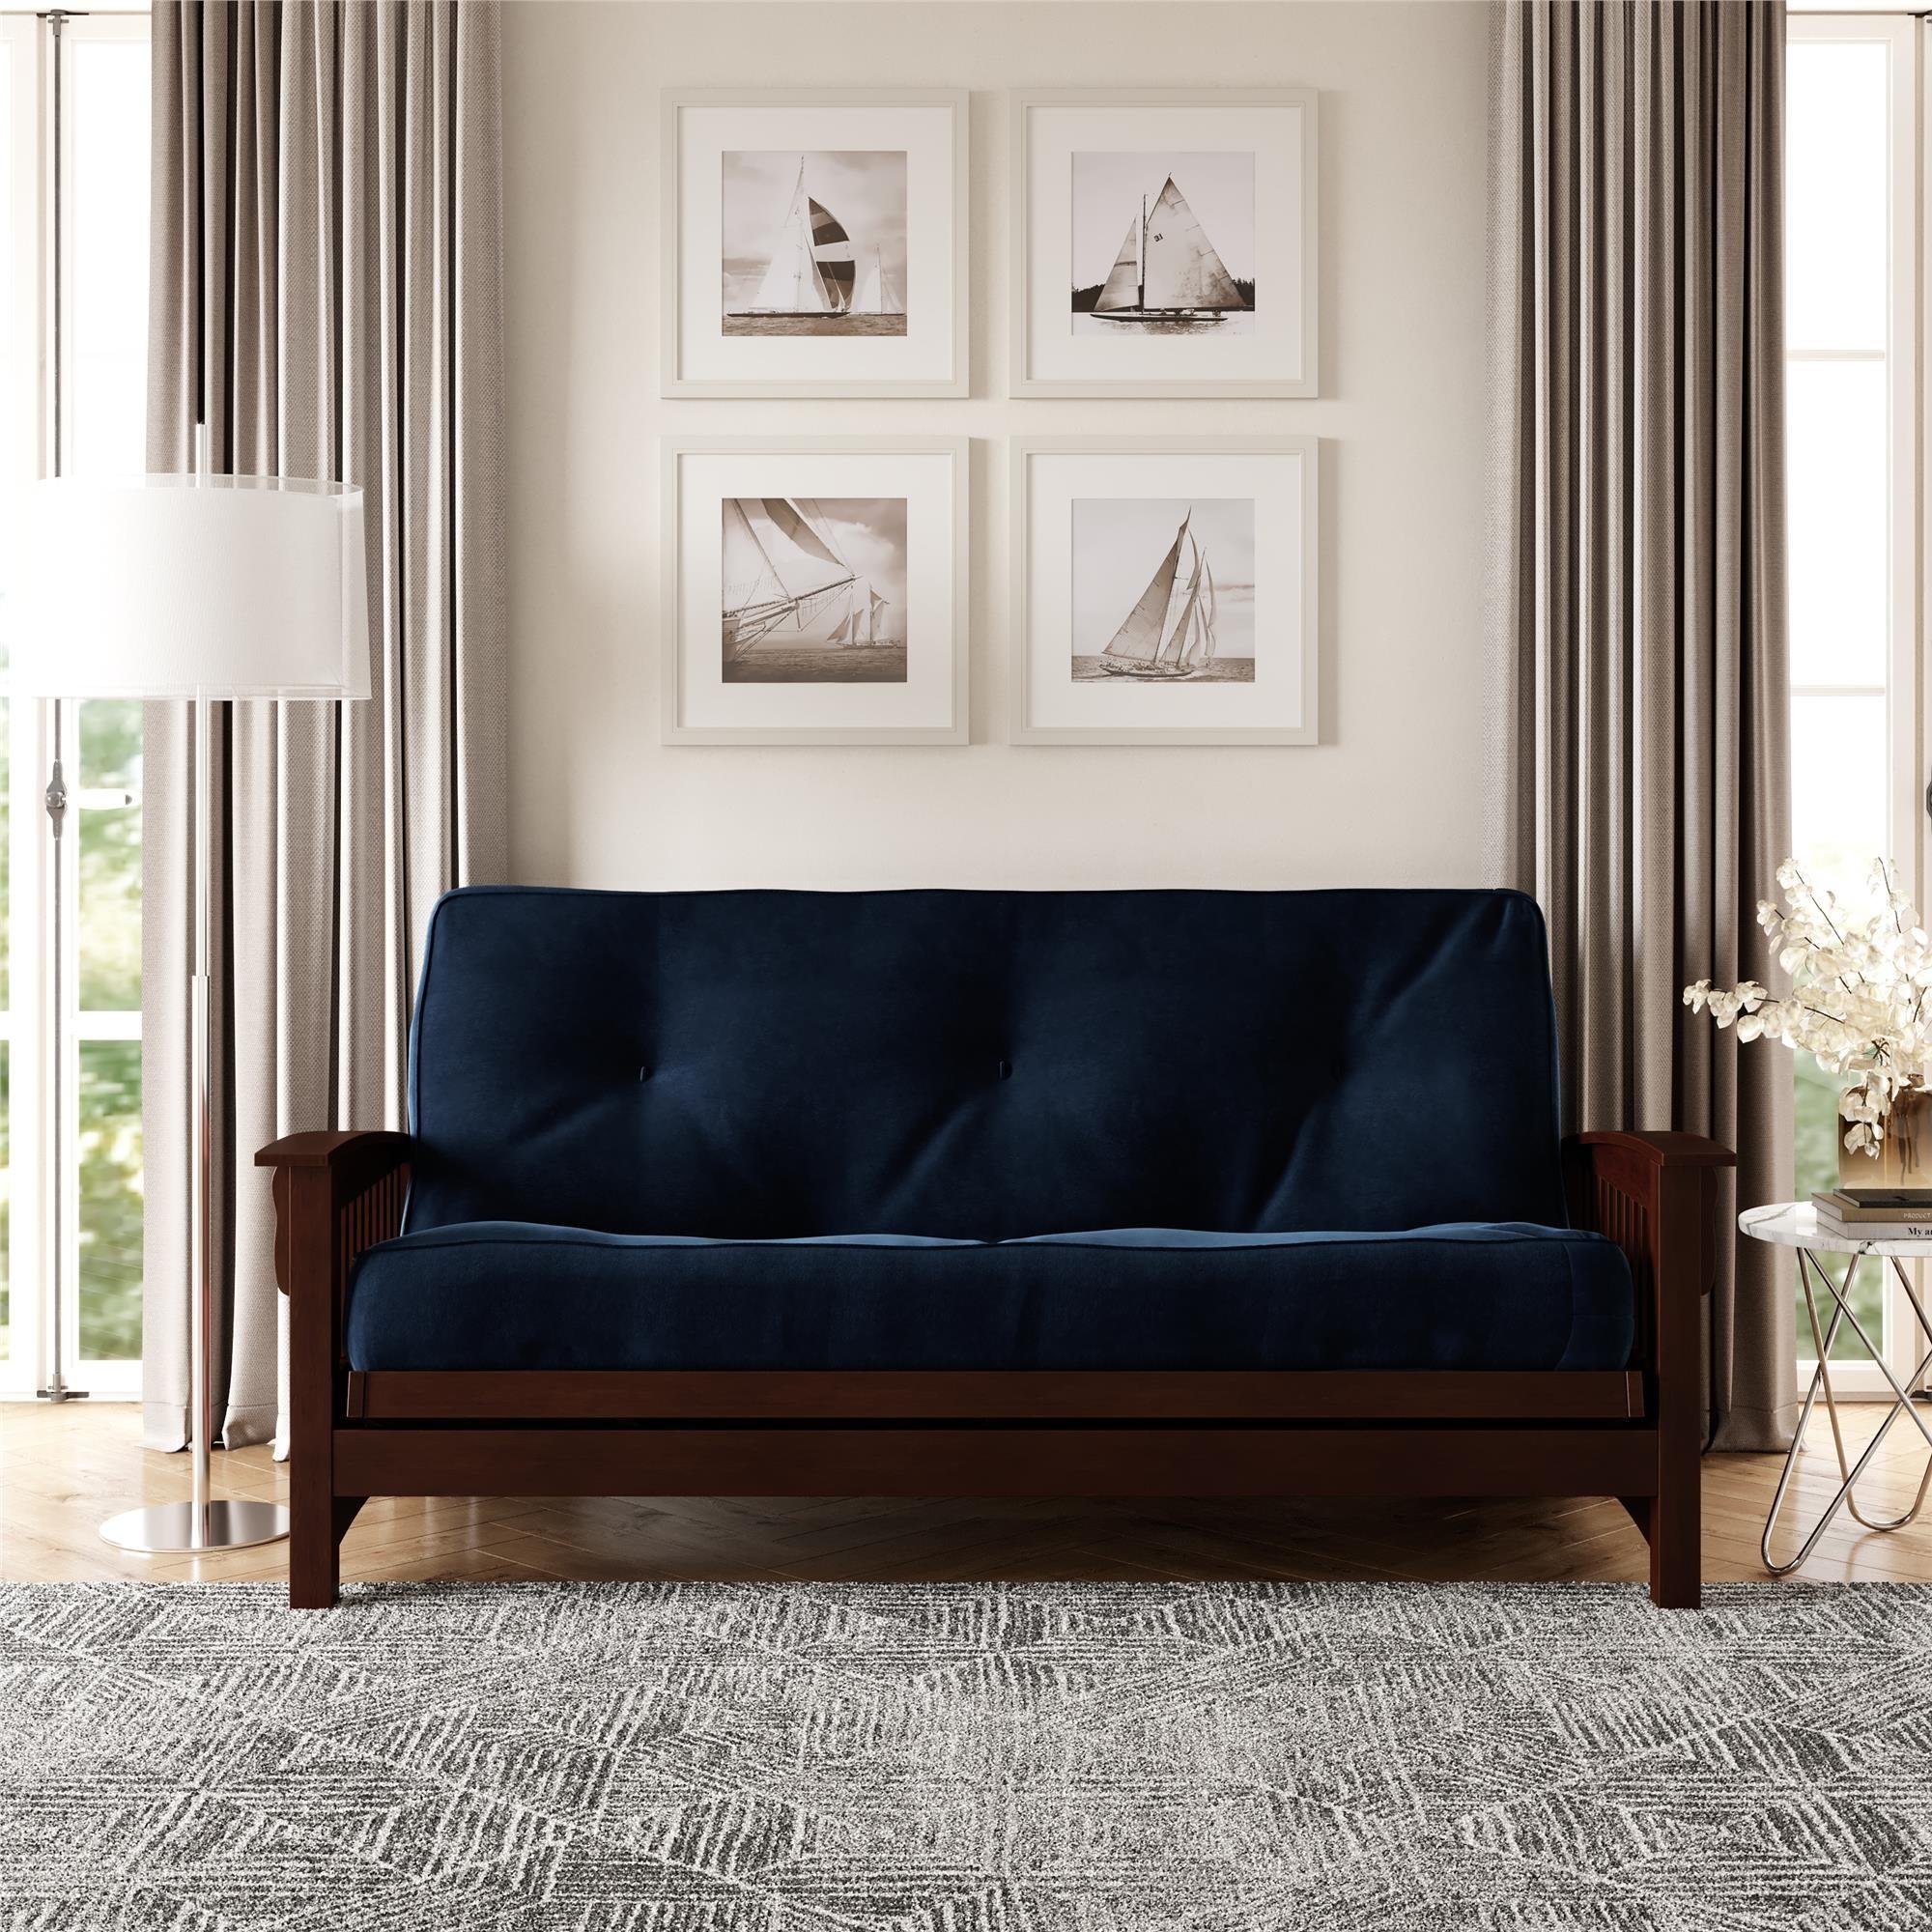 The blue futon under a set of photos